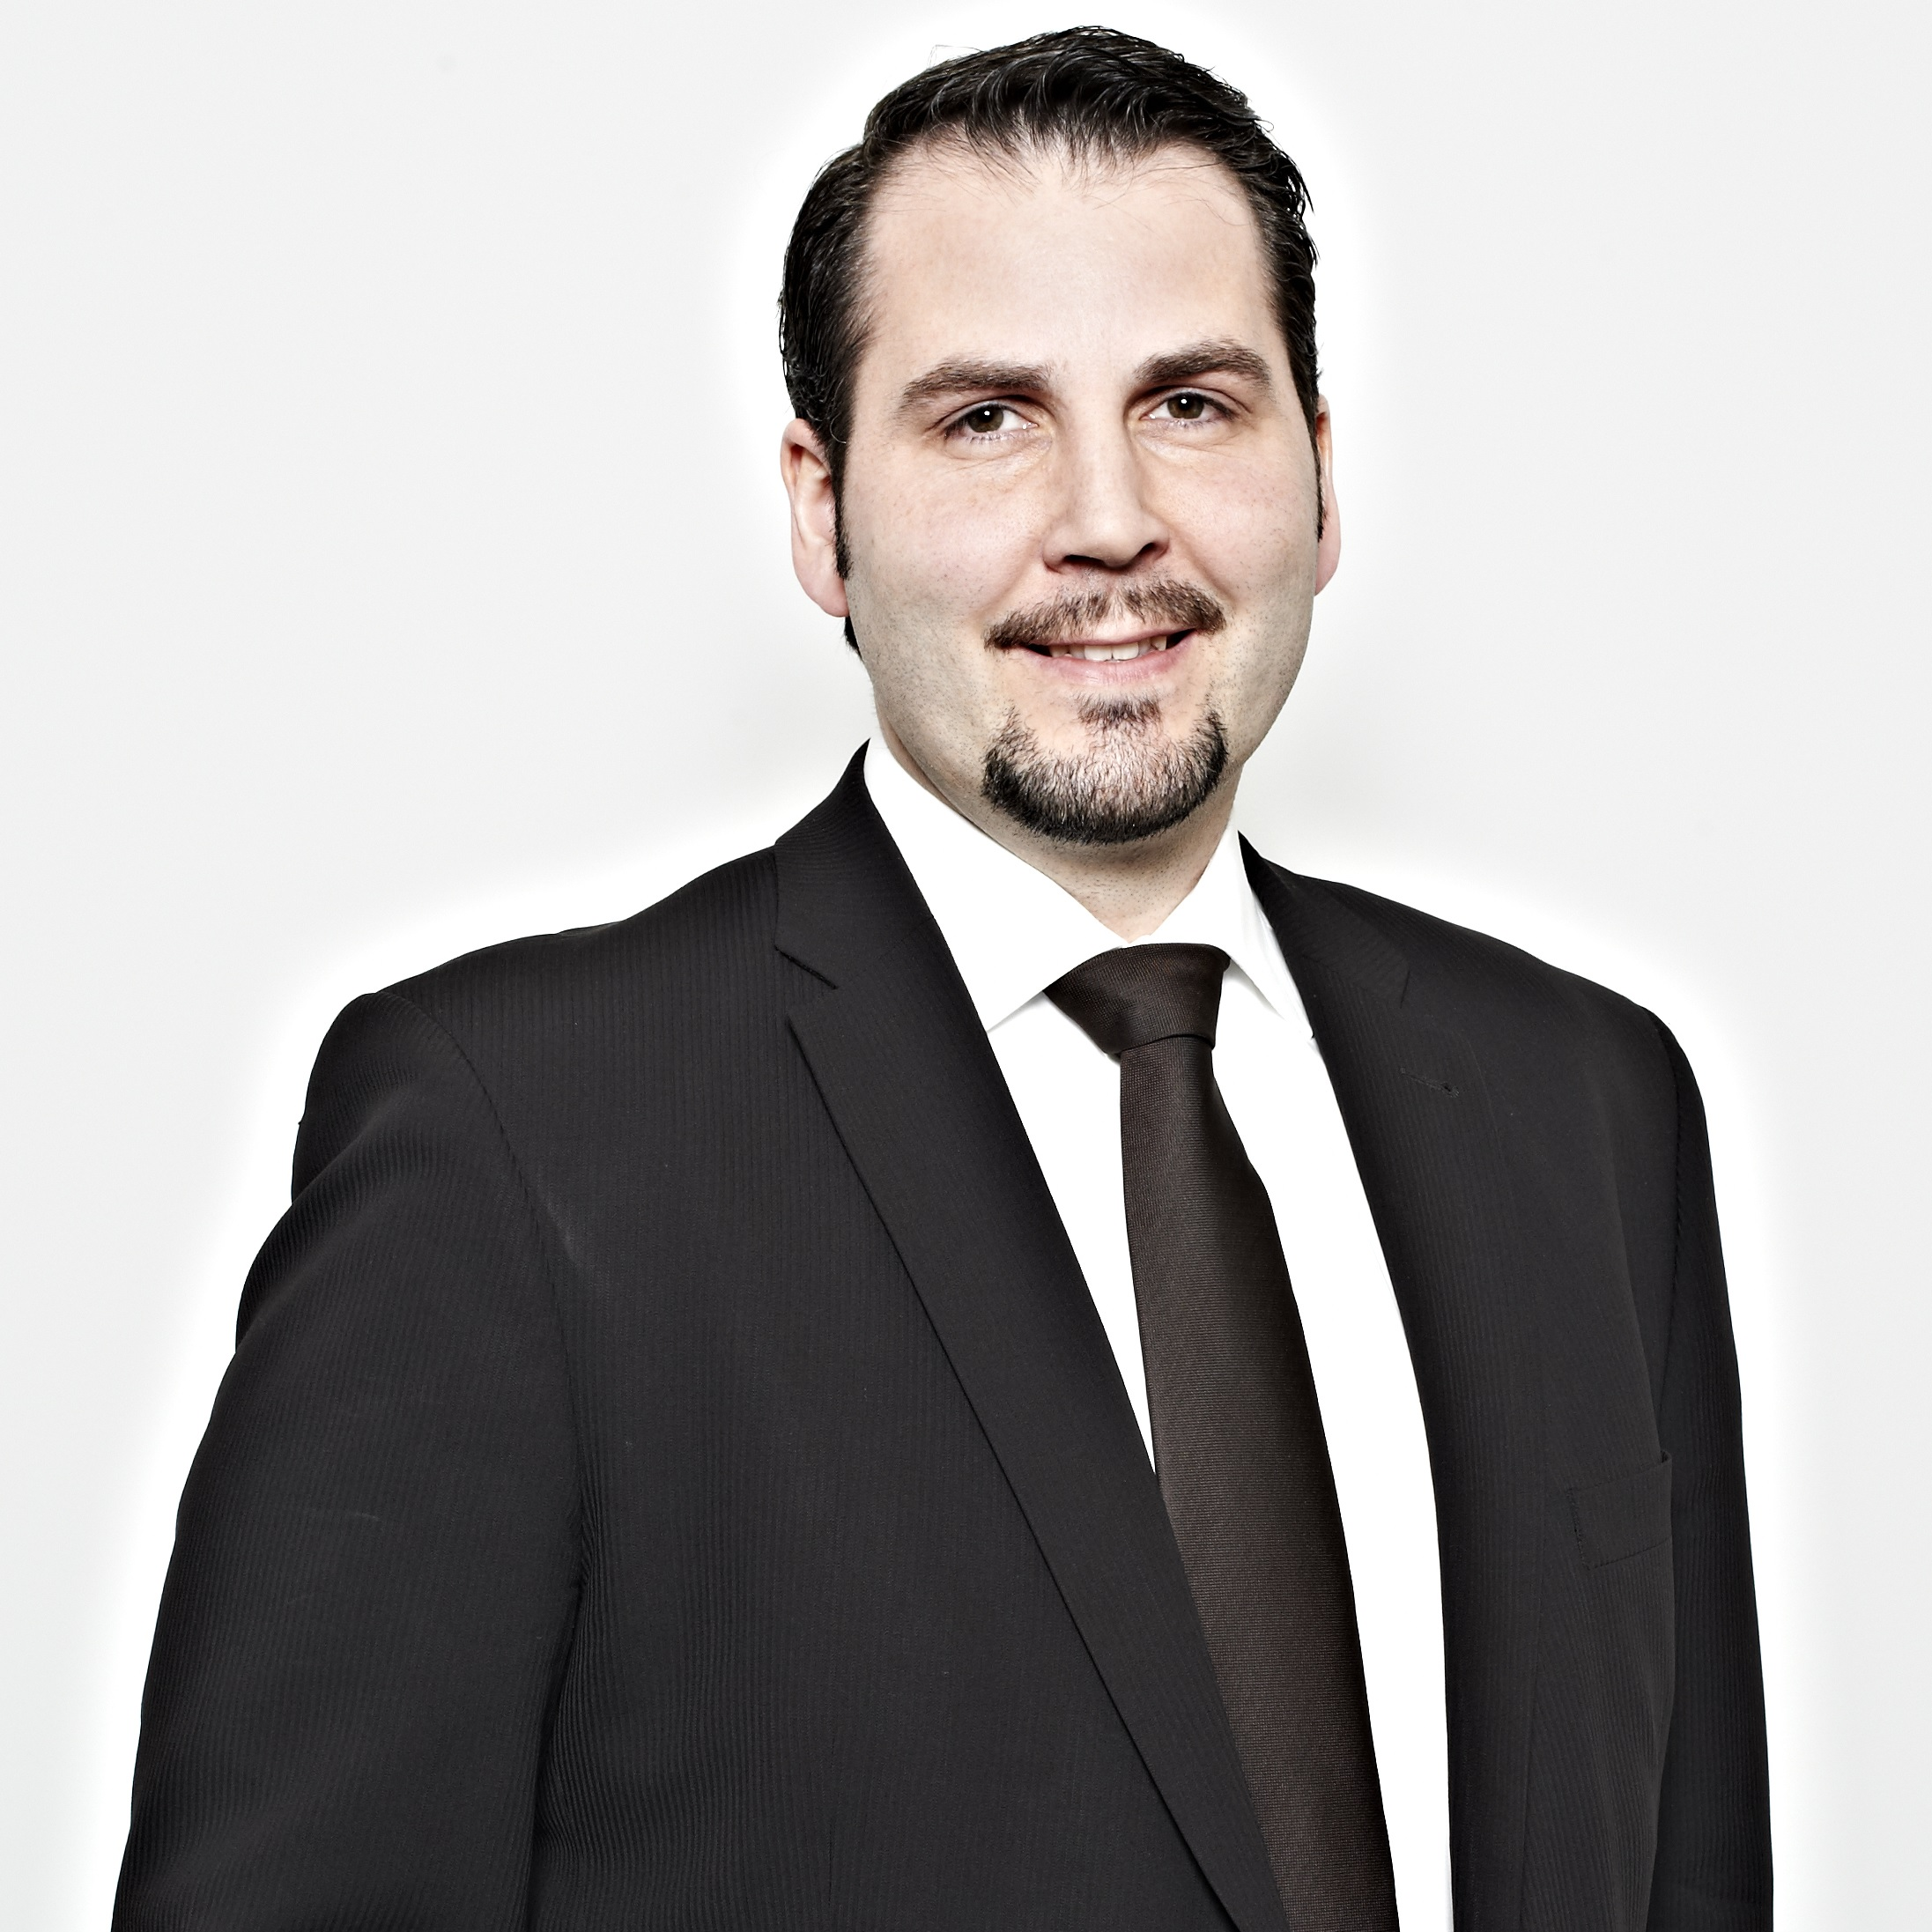 Dr. Matthias Postina, Konzern IT IT-Innovationsmanagement at EWE AG